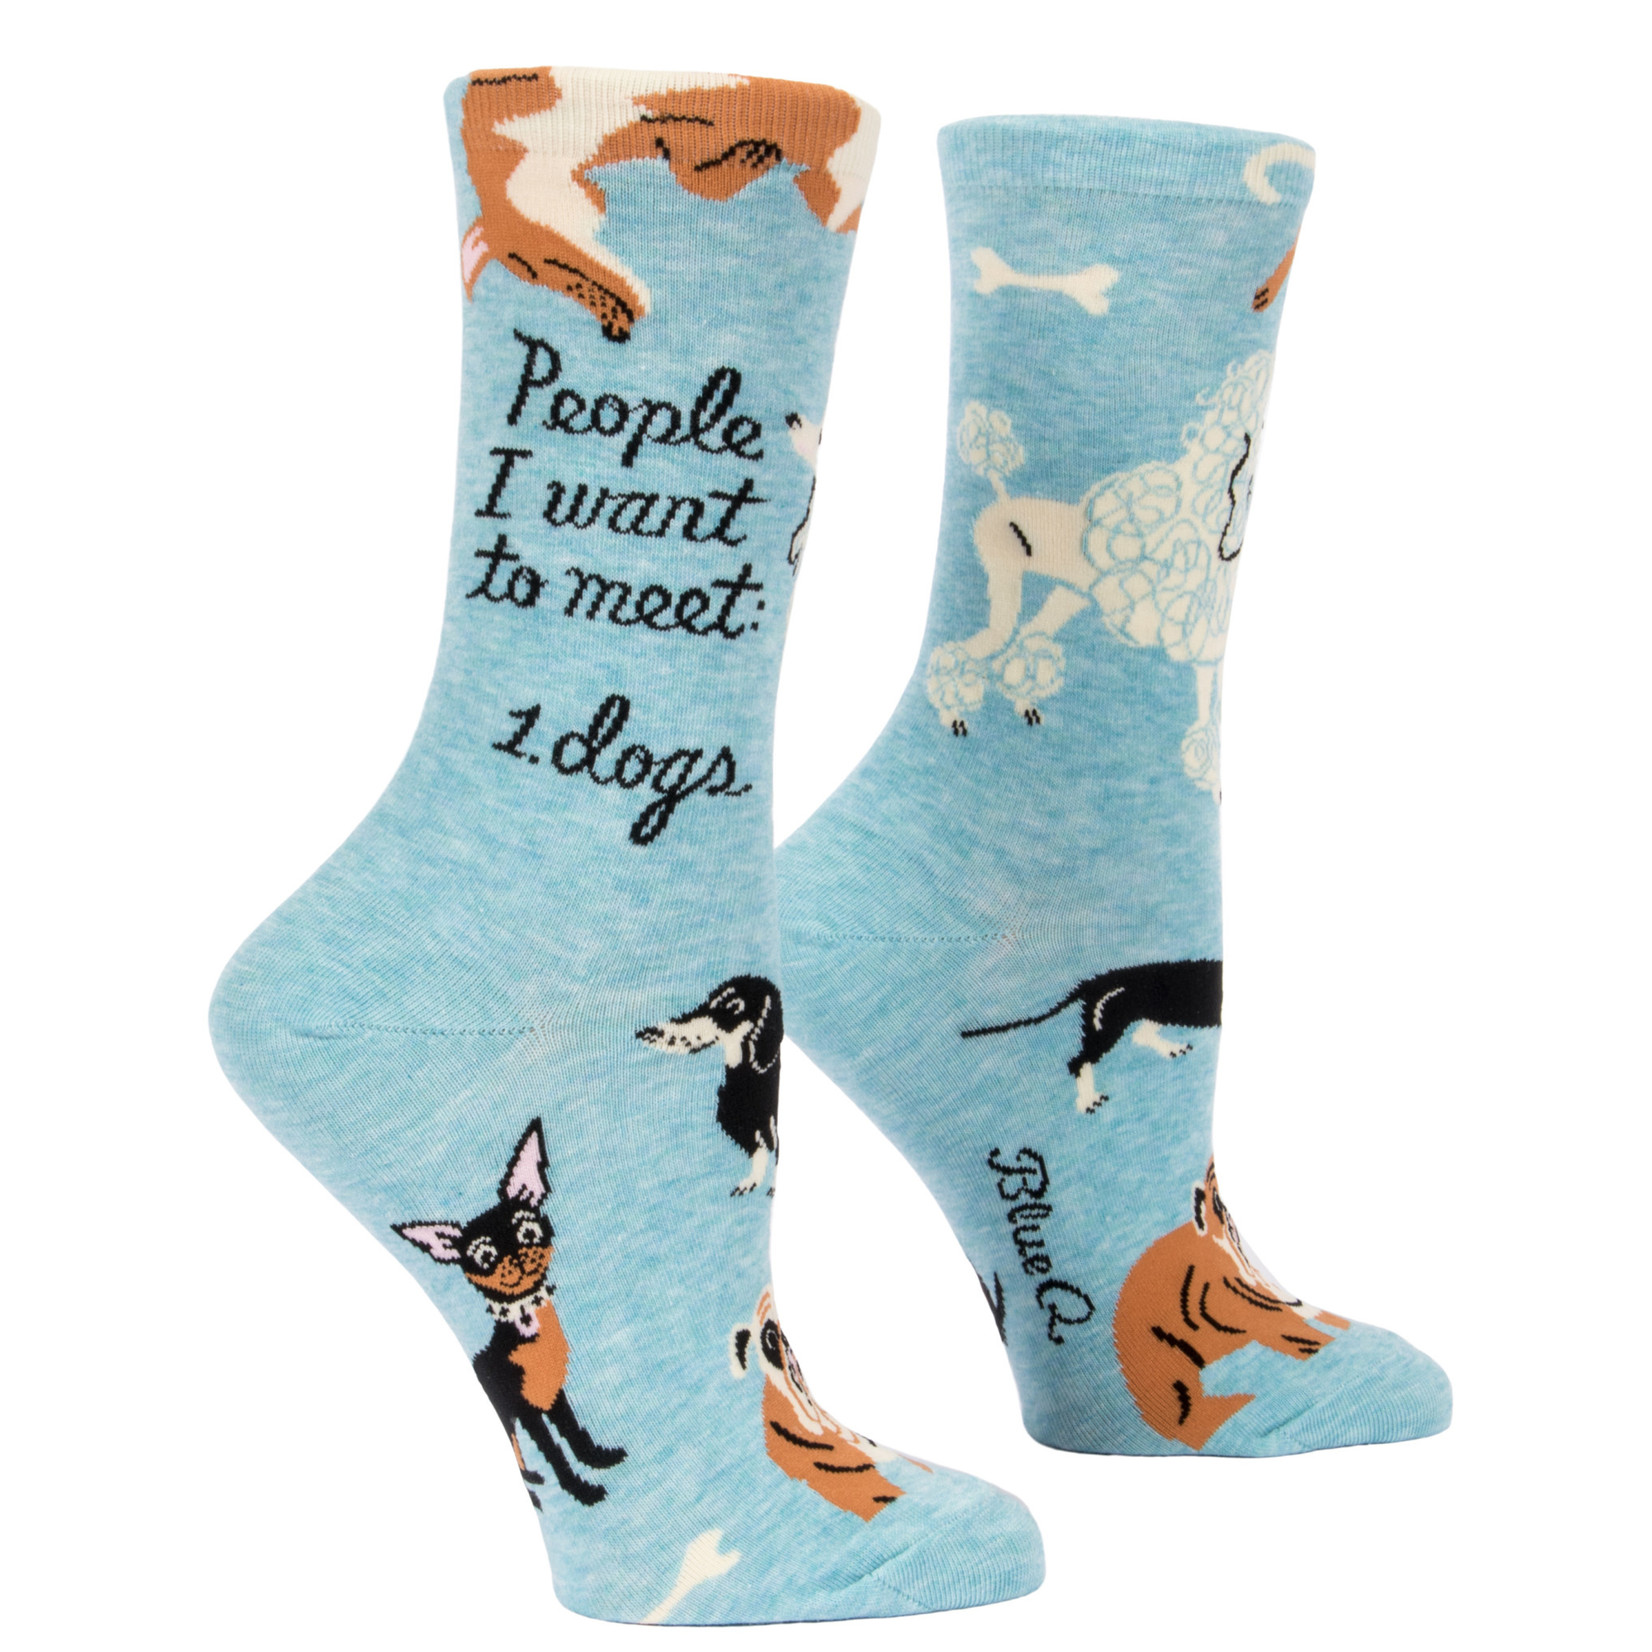 Blue Q Womens Crew Socks - People To Meet: Dogs